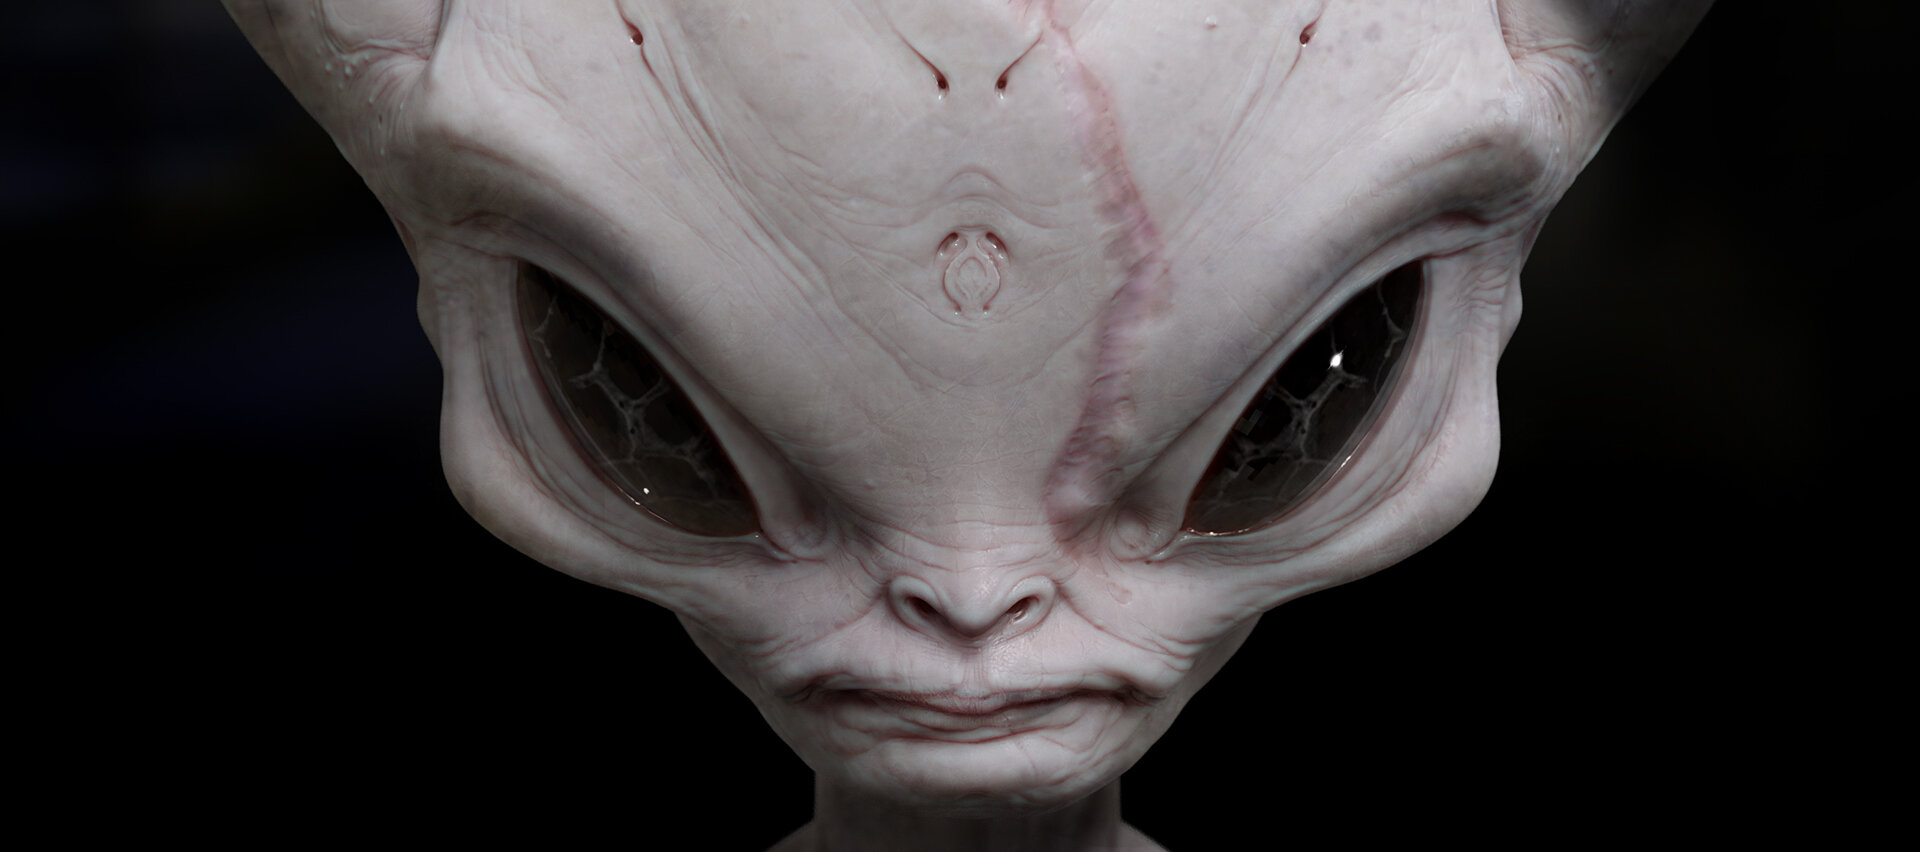 Alien_Jeff_McAteer_02.jpg